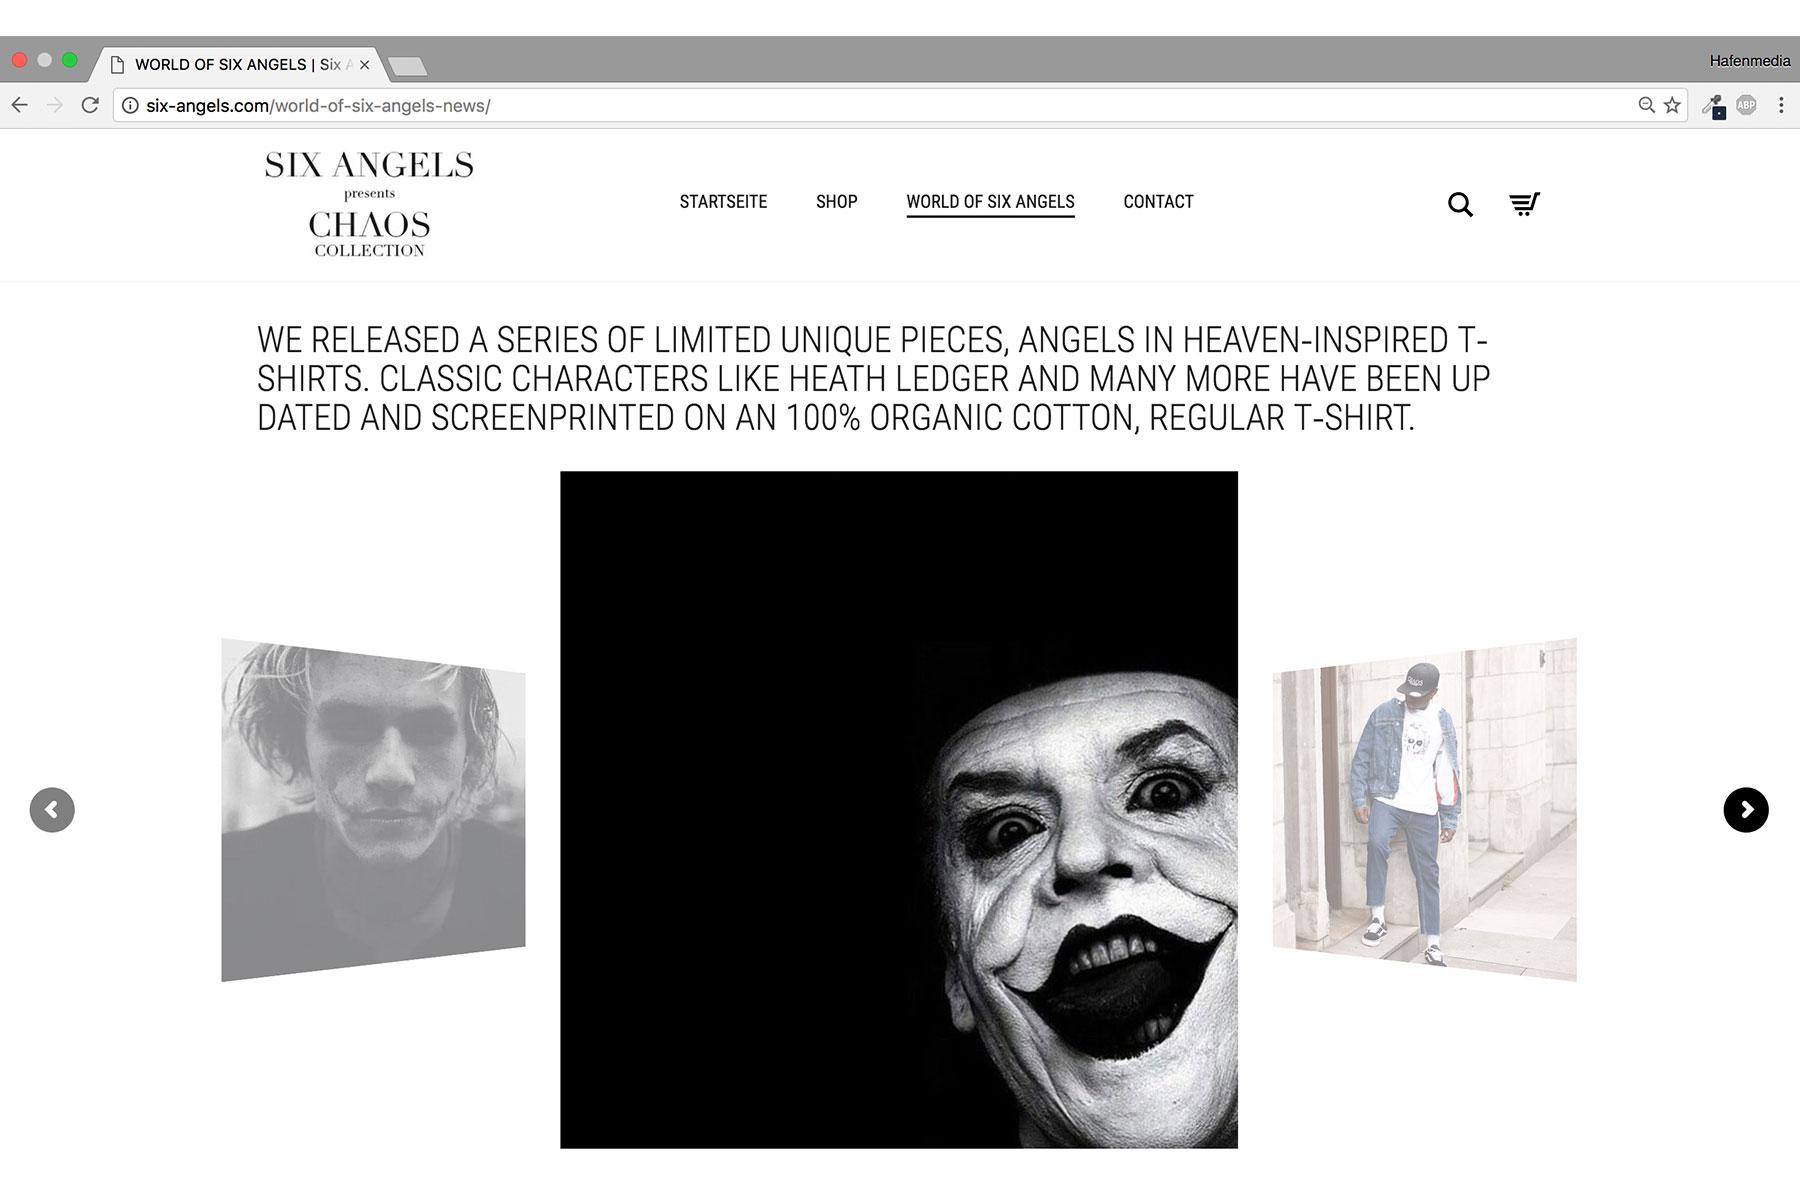 webdesign-duesseldorf-hafenmedia-six-angels-porfolio1